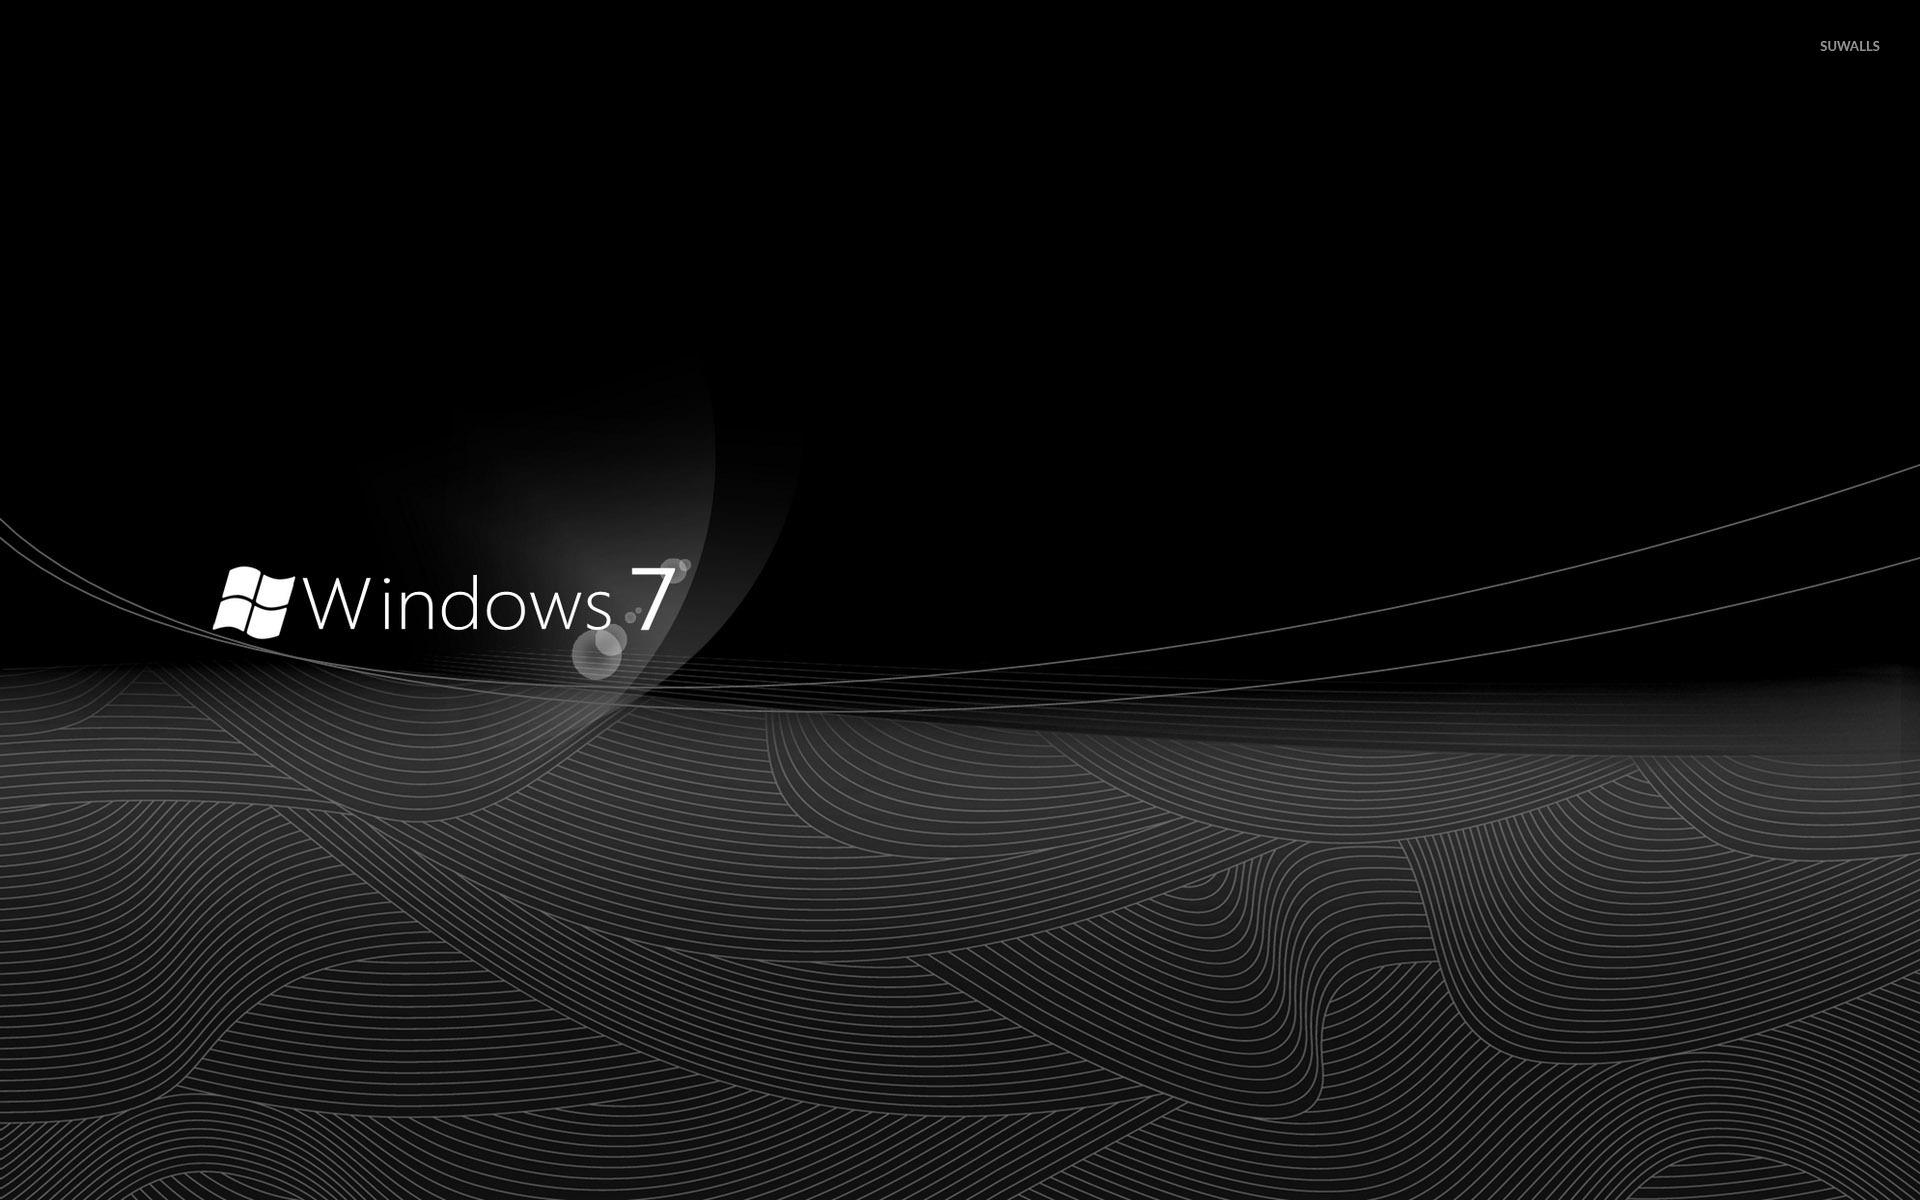 windows 7 [8] wallpaper - computer wallpapers - #5512